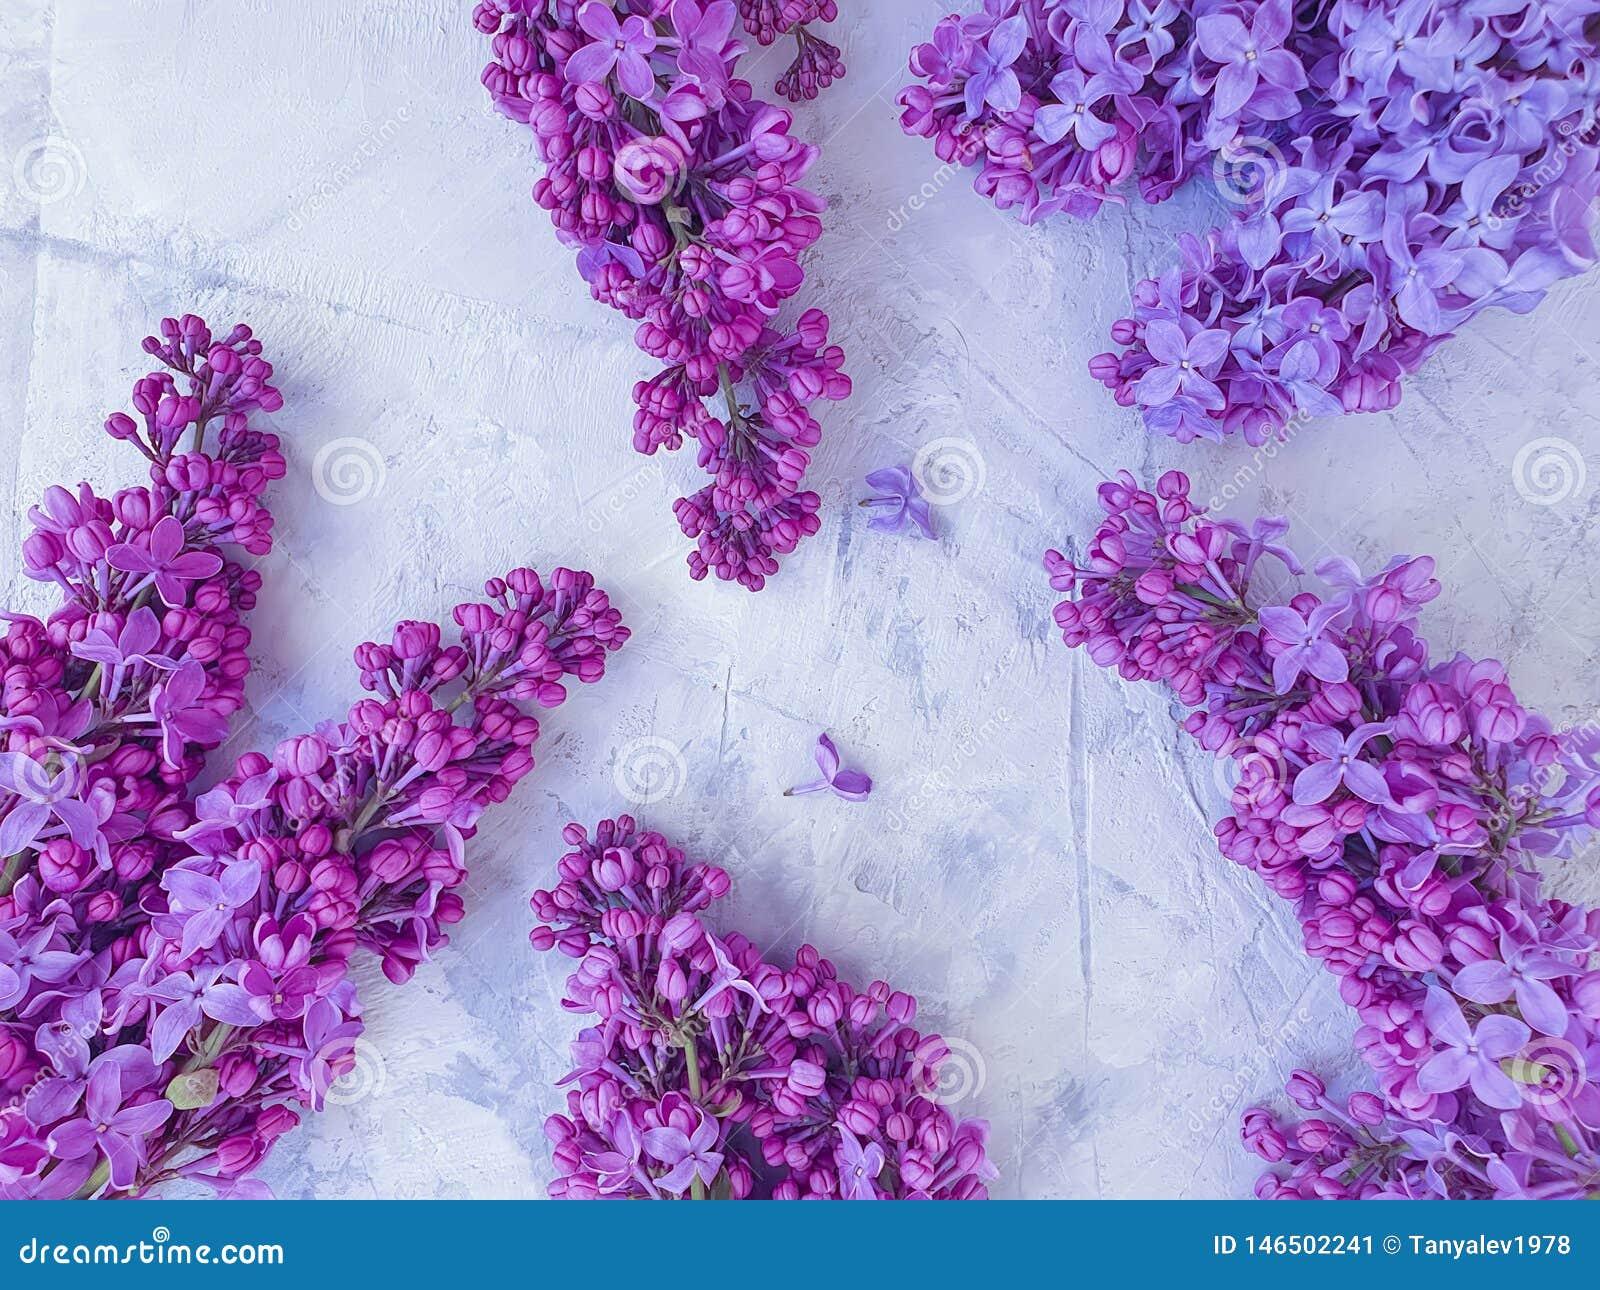 Beautiful lilac natural celebration romantic bouquetflower invitation on gray concrete background frame